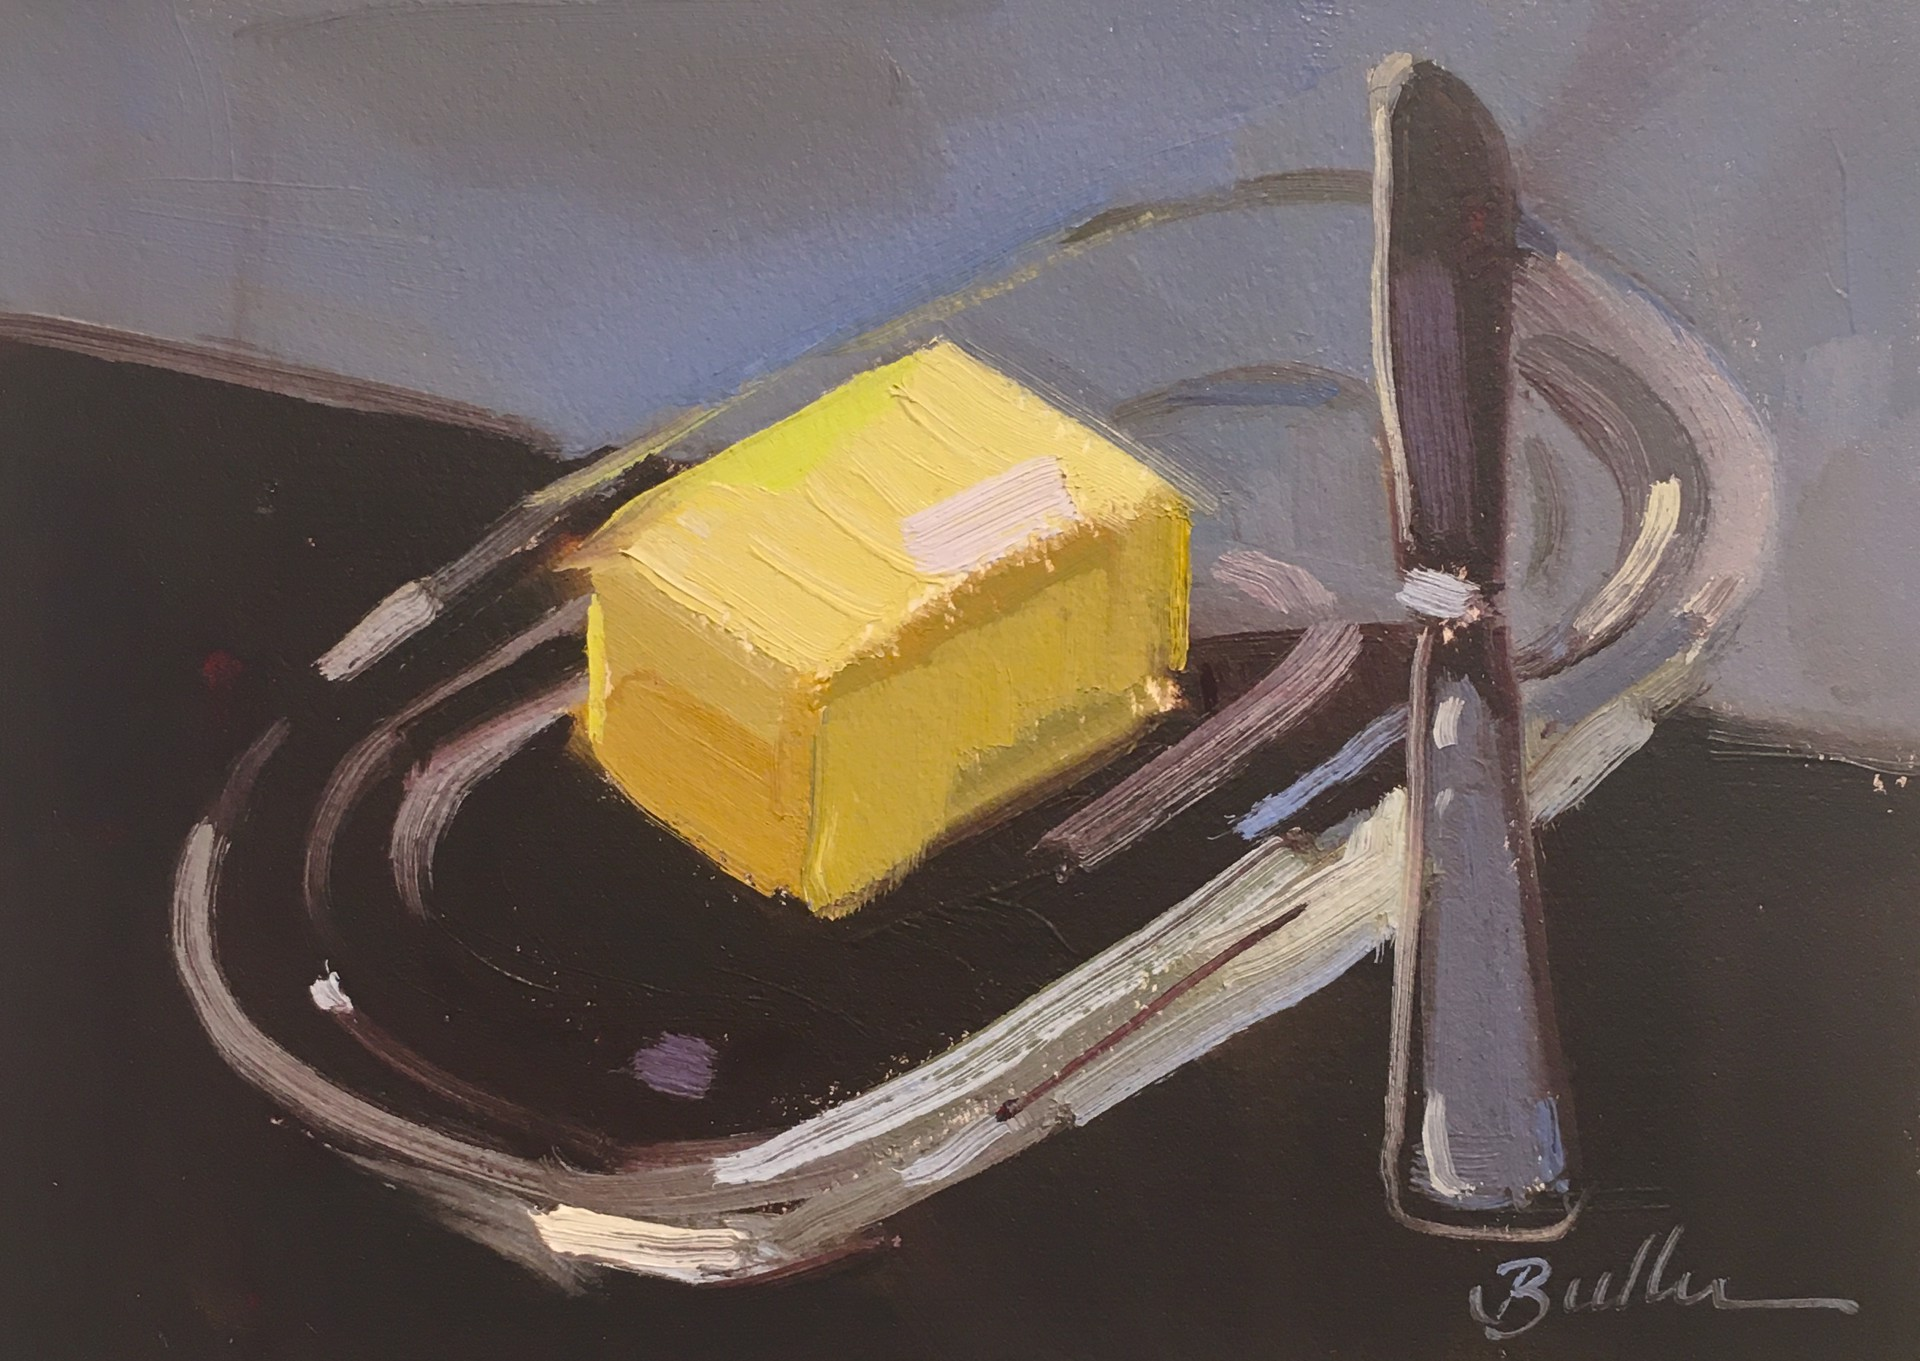 The Butter Dish by Samantha Buller